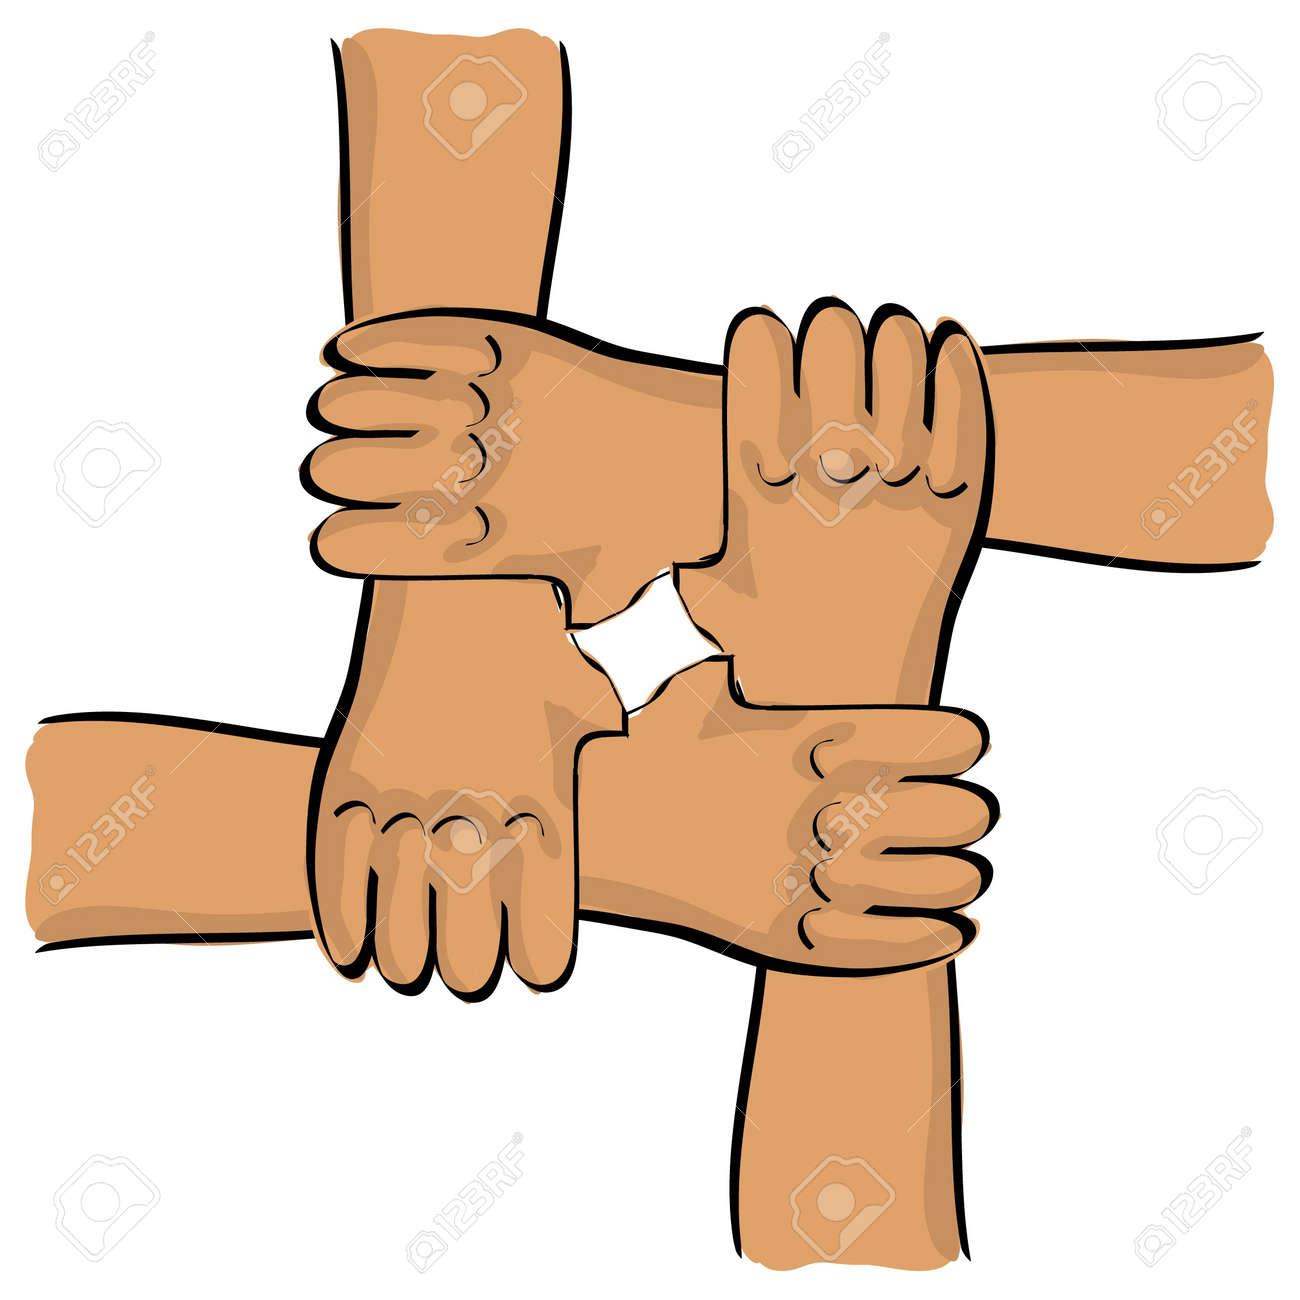 symbolic teamwork hands connection - illustration Stock Vector - 12452966